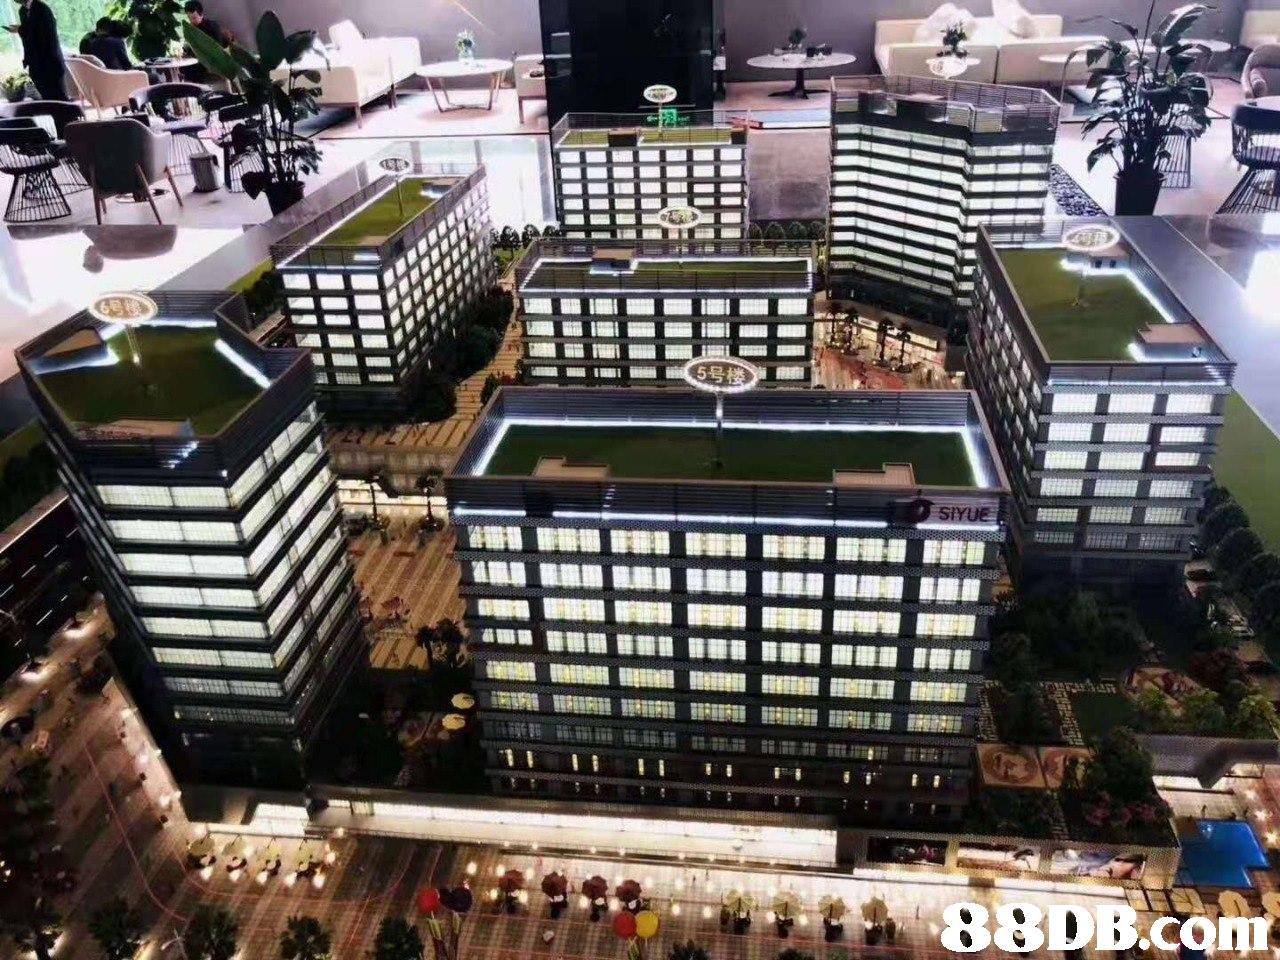 BBDB.con  Metropolitan area,Urban design,Urban area,Architecture,Mixed-use